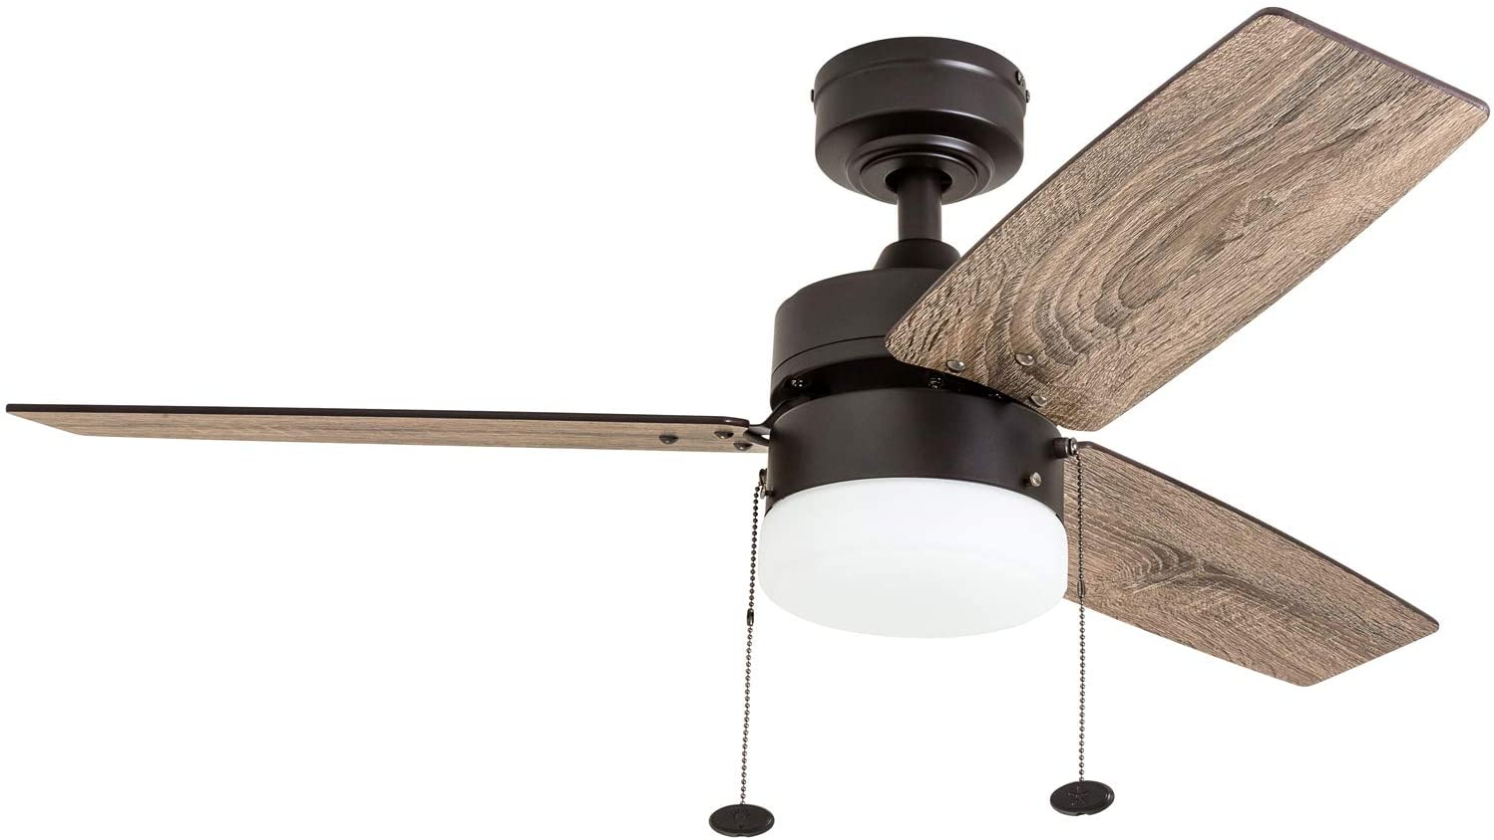 "Prominence Home 51015 Reston Farmhouse Ceiling Fan, 42"", Bronze"